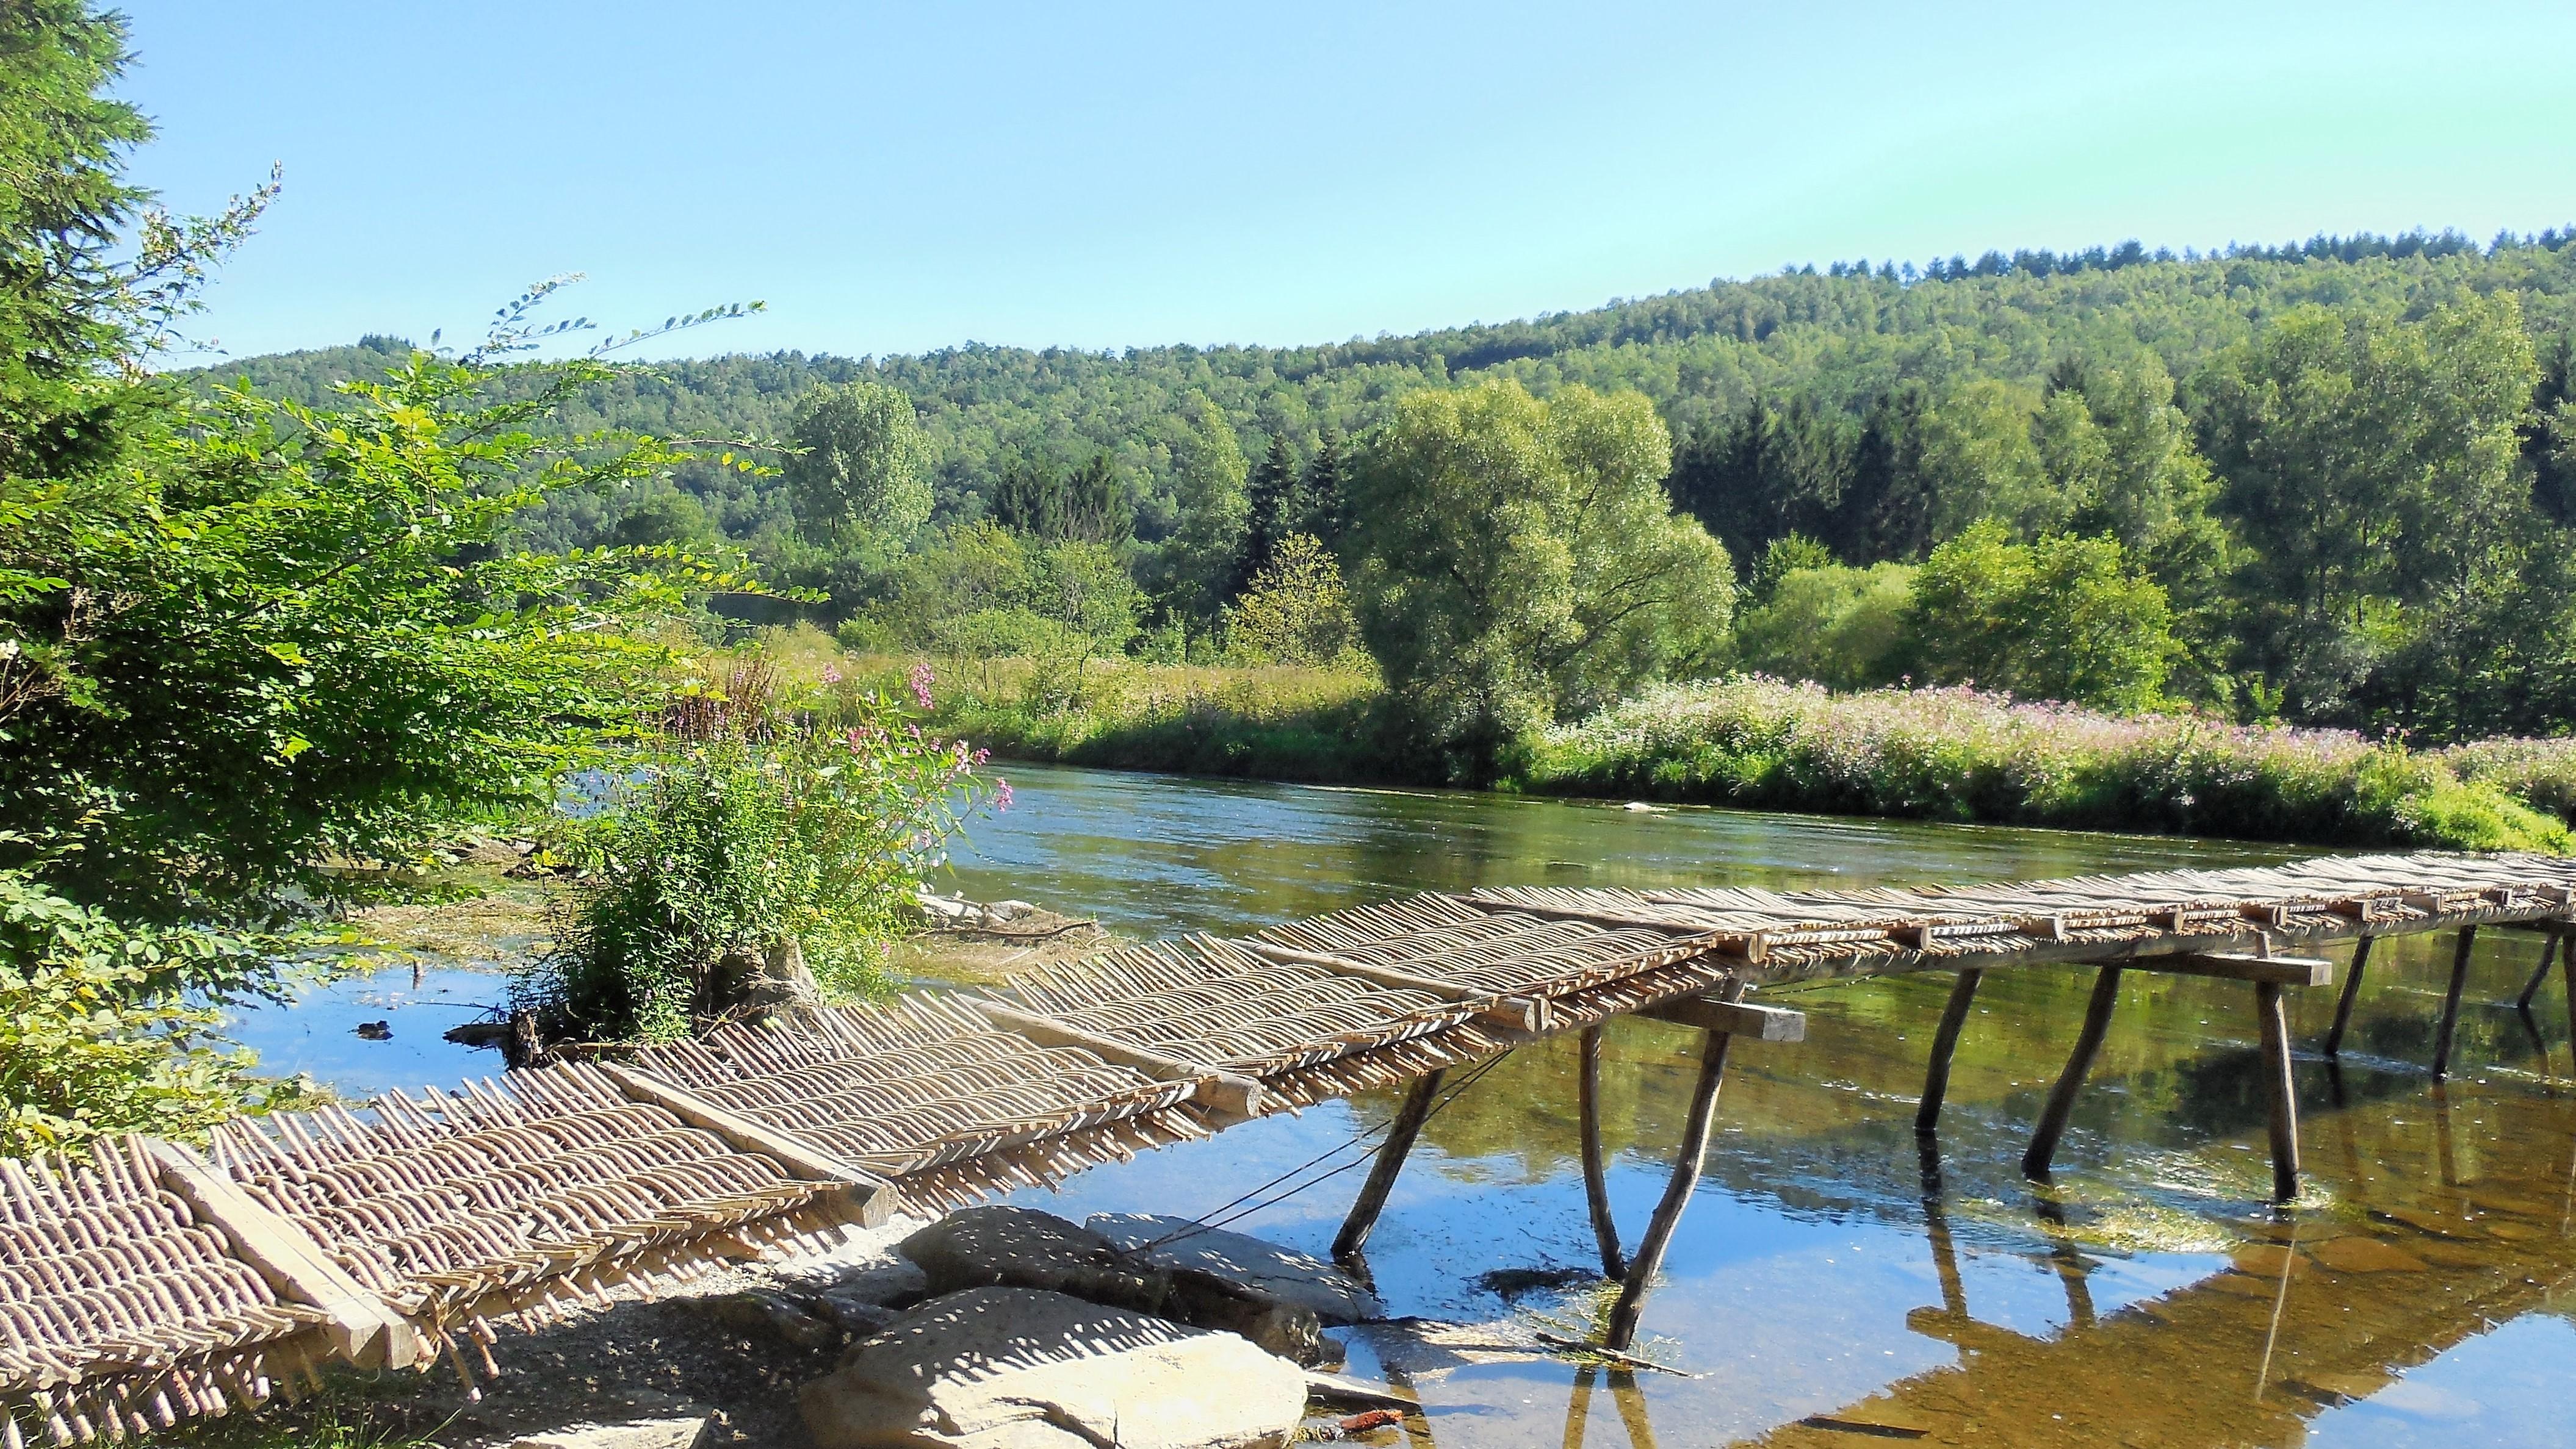 Pont de Claies